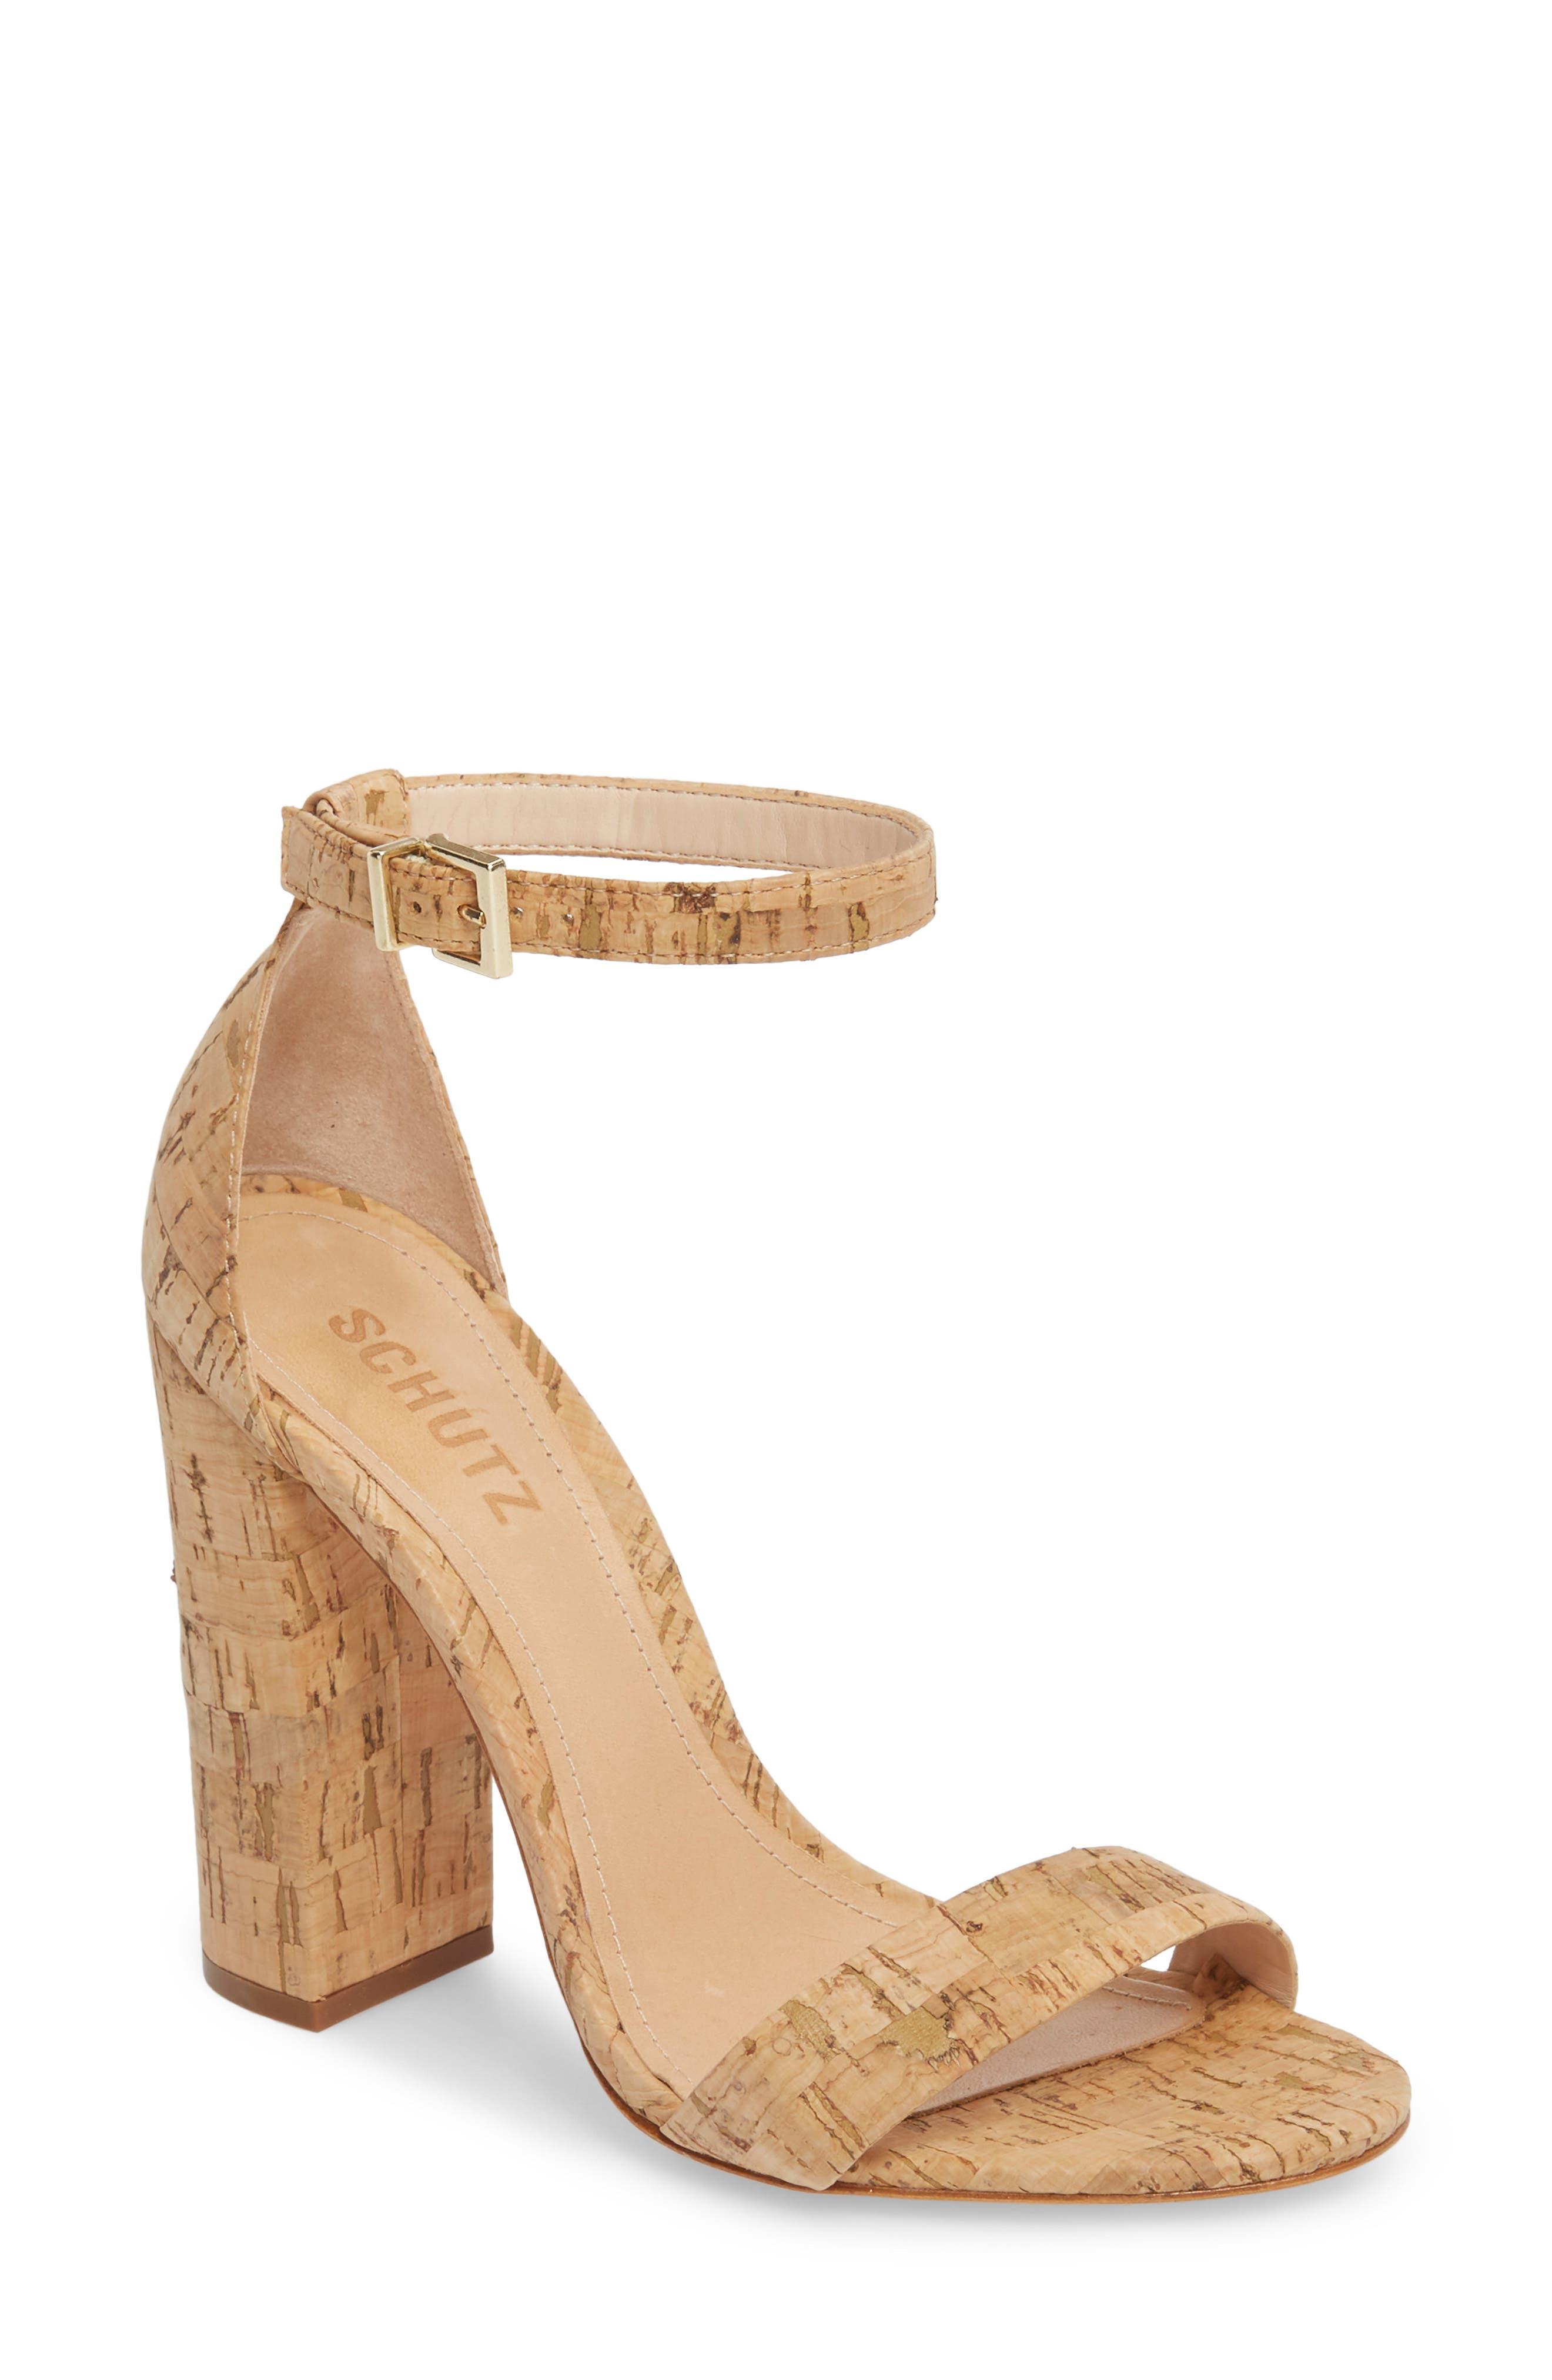 Enida Sandal,                         Main,                         color, CORK